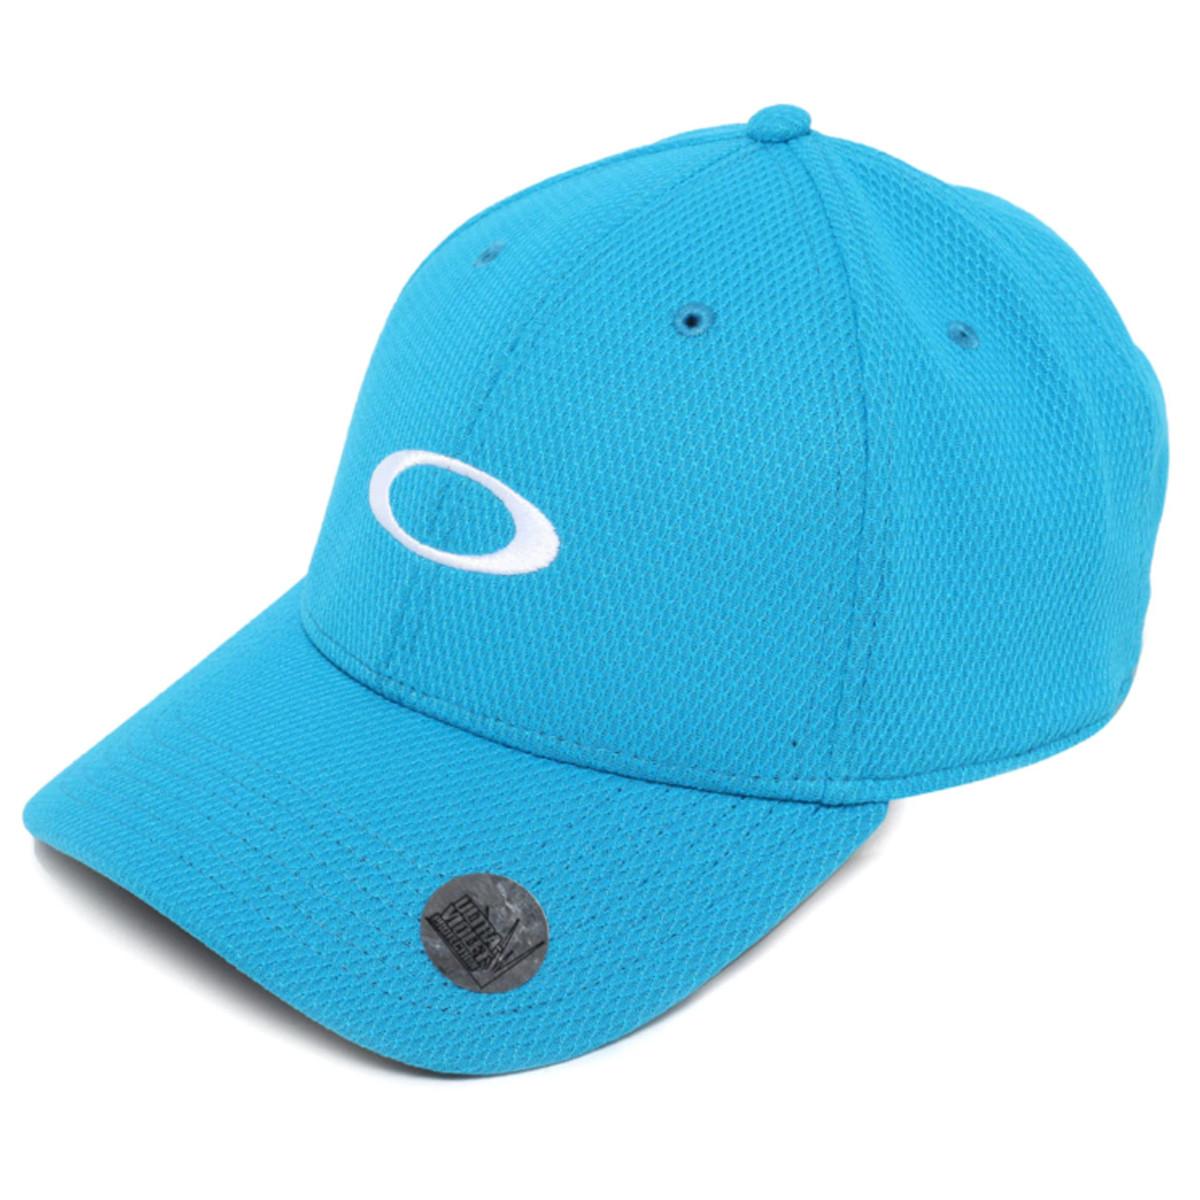 Boné Oakley Golf Ellipse Hat Azul Bebe ref 91809-6B2 5154bd6b700